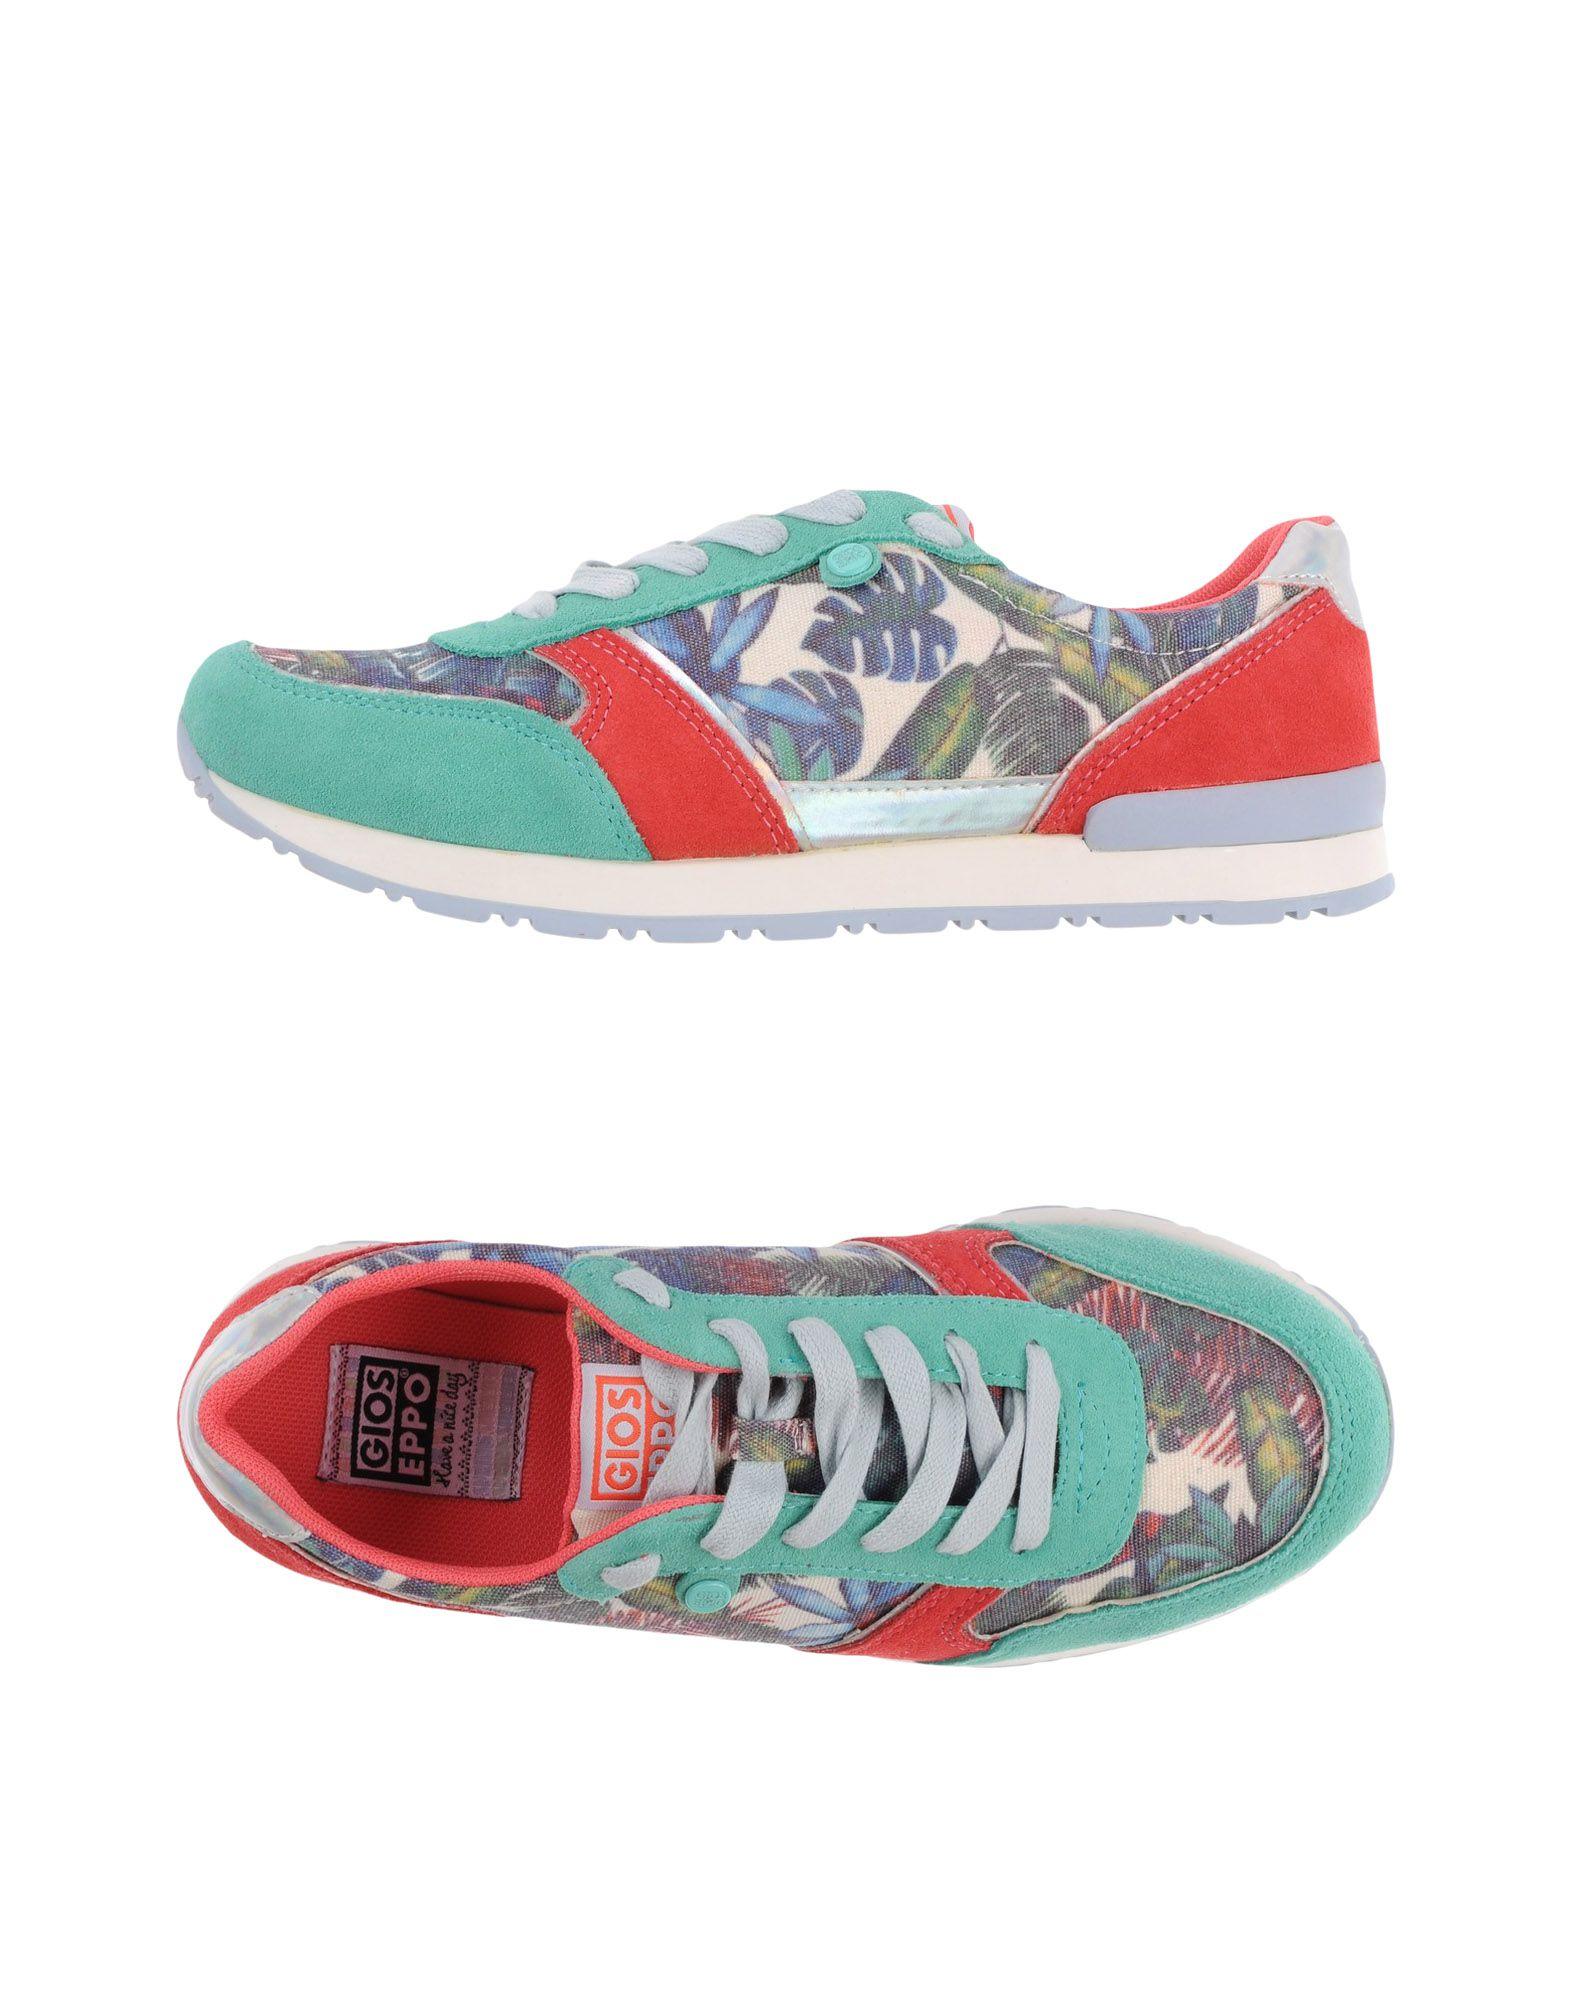 Gioseppo Sneakers online - Women Gioseppo Sneakers online Sneakers on  Australia - 11109681TB 88c11d